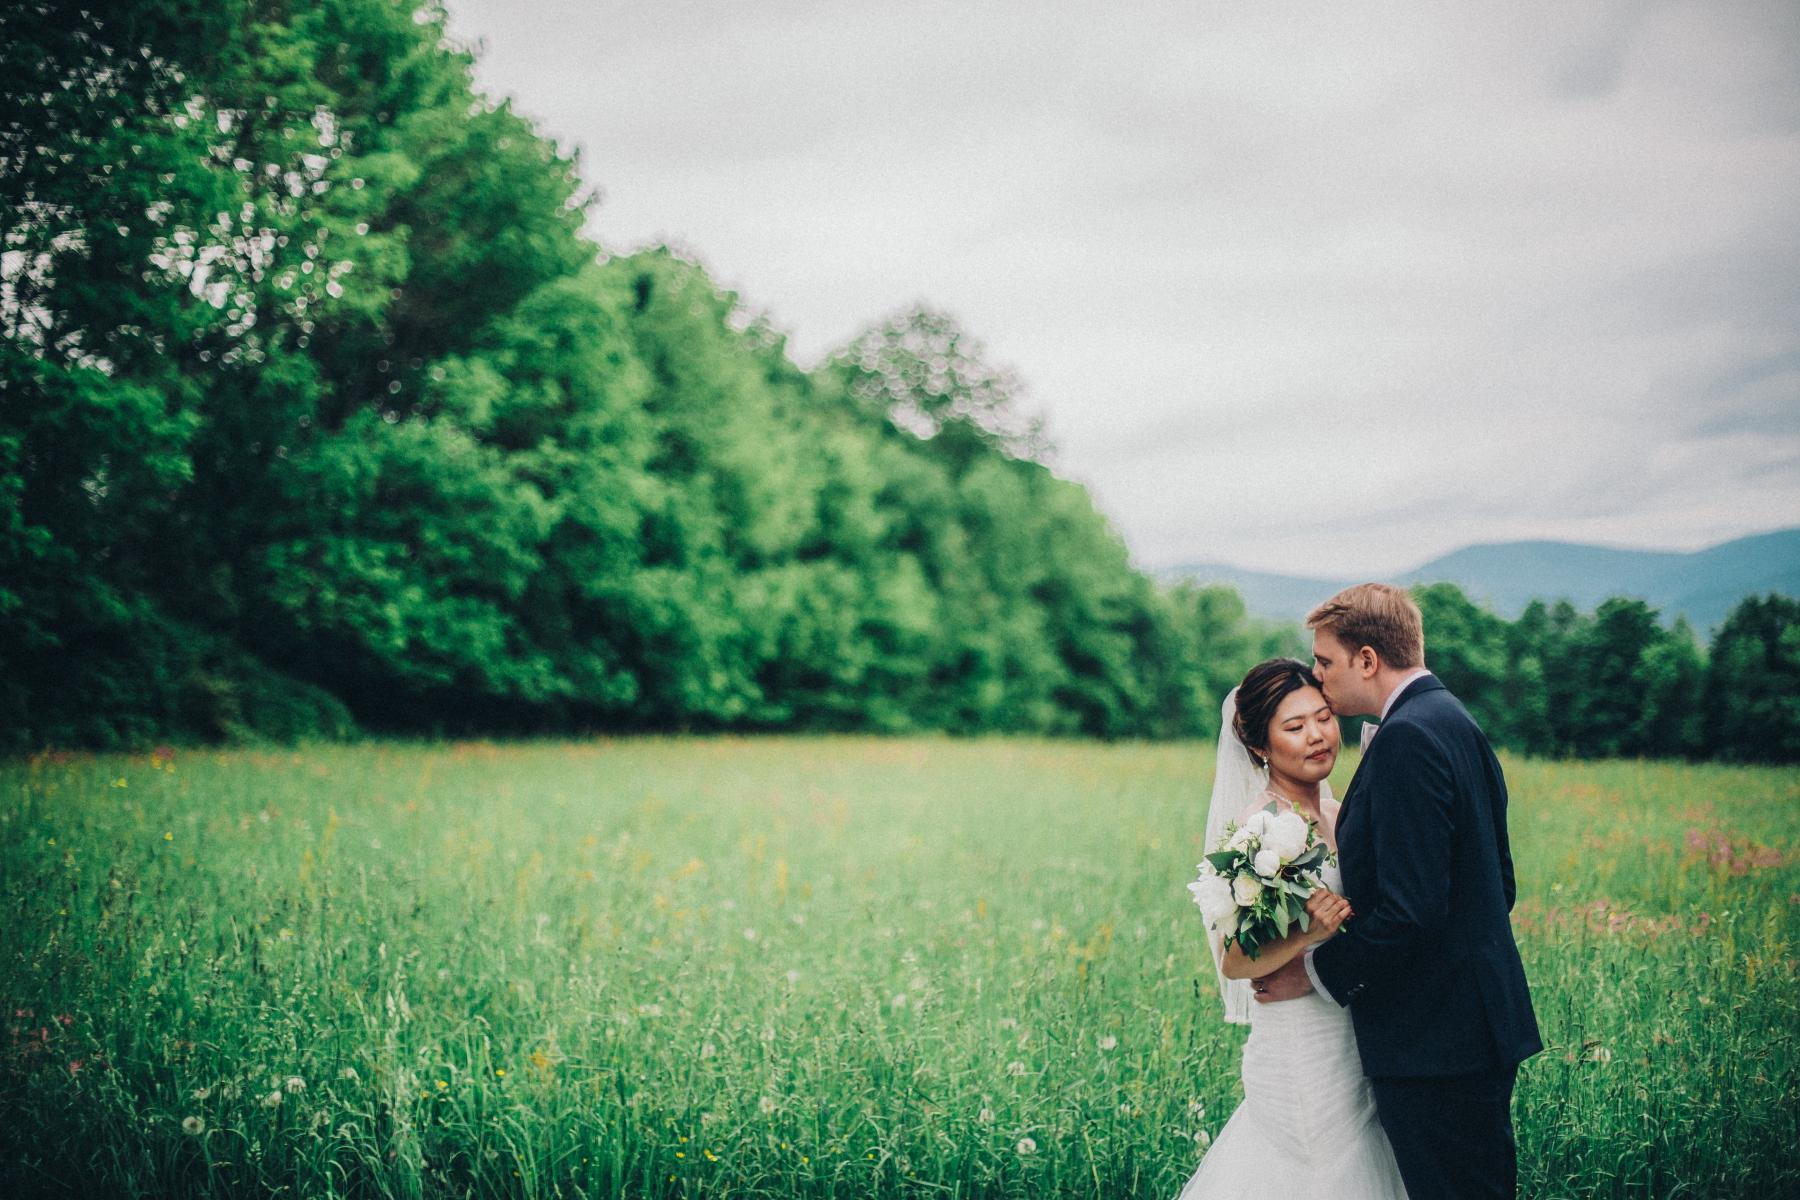 Hasol&Aaron_wedding_0597.JPG